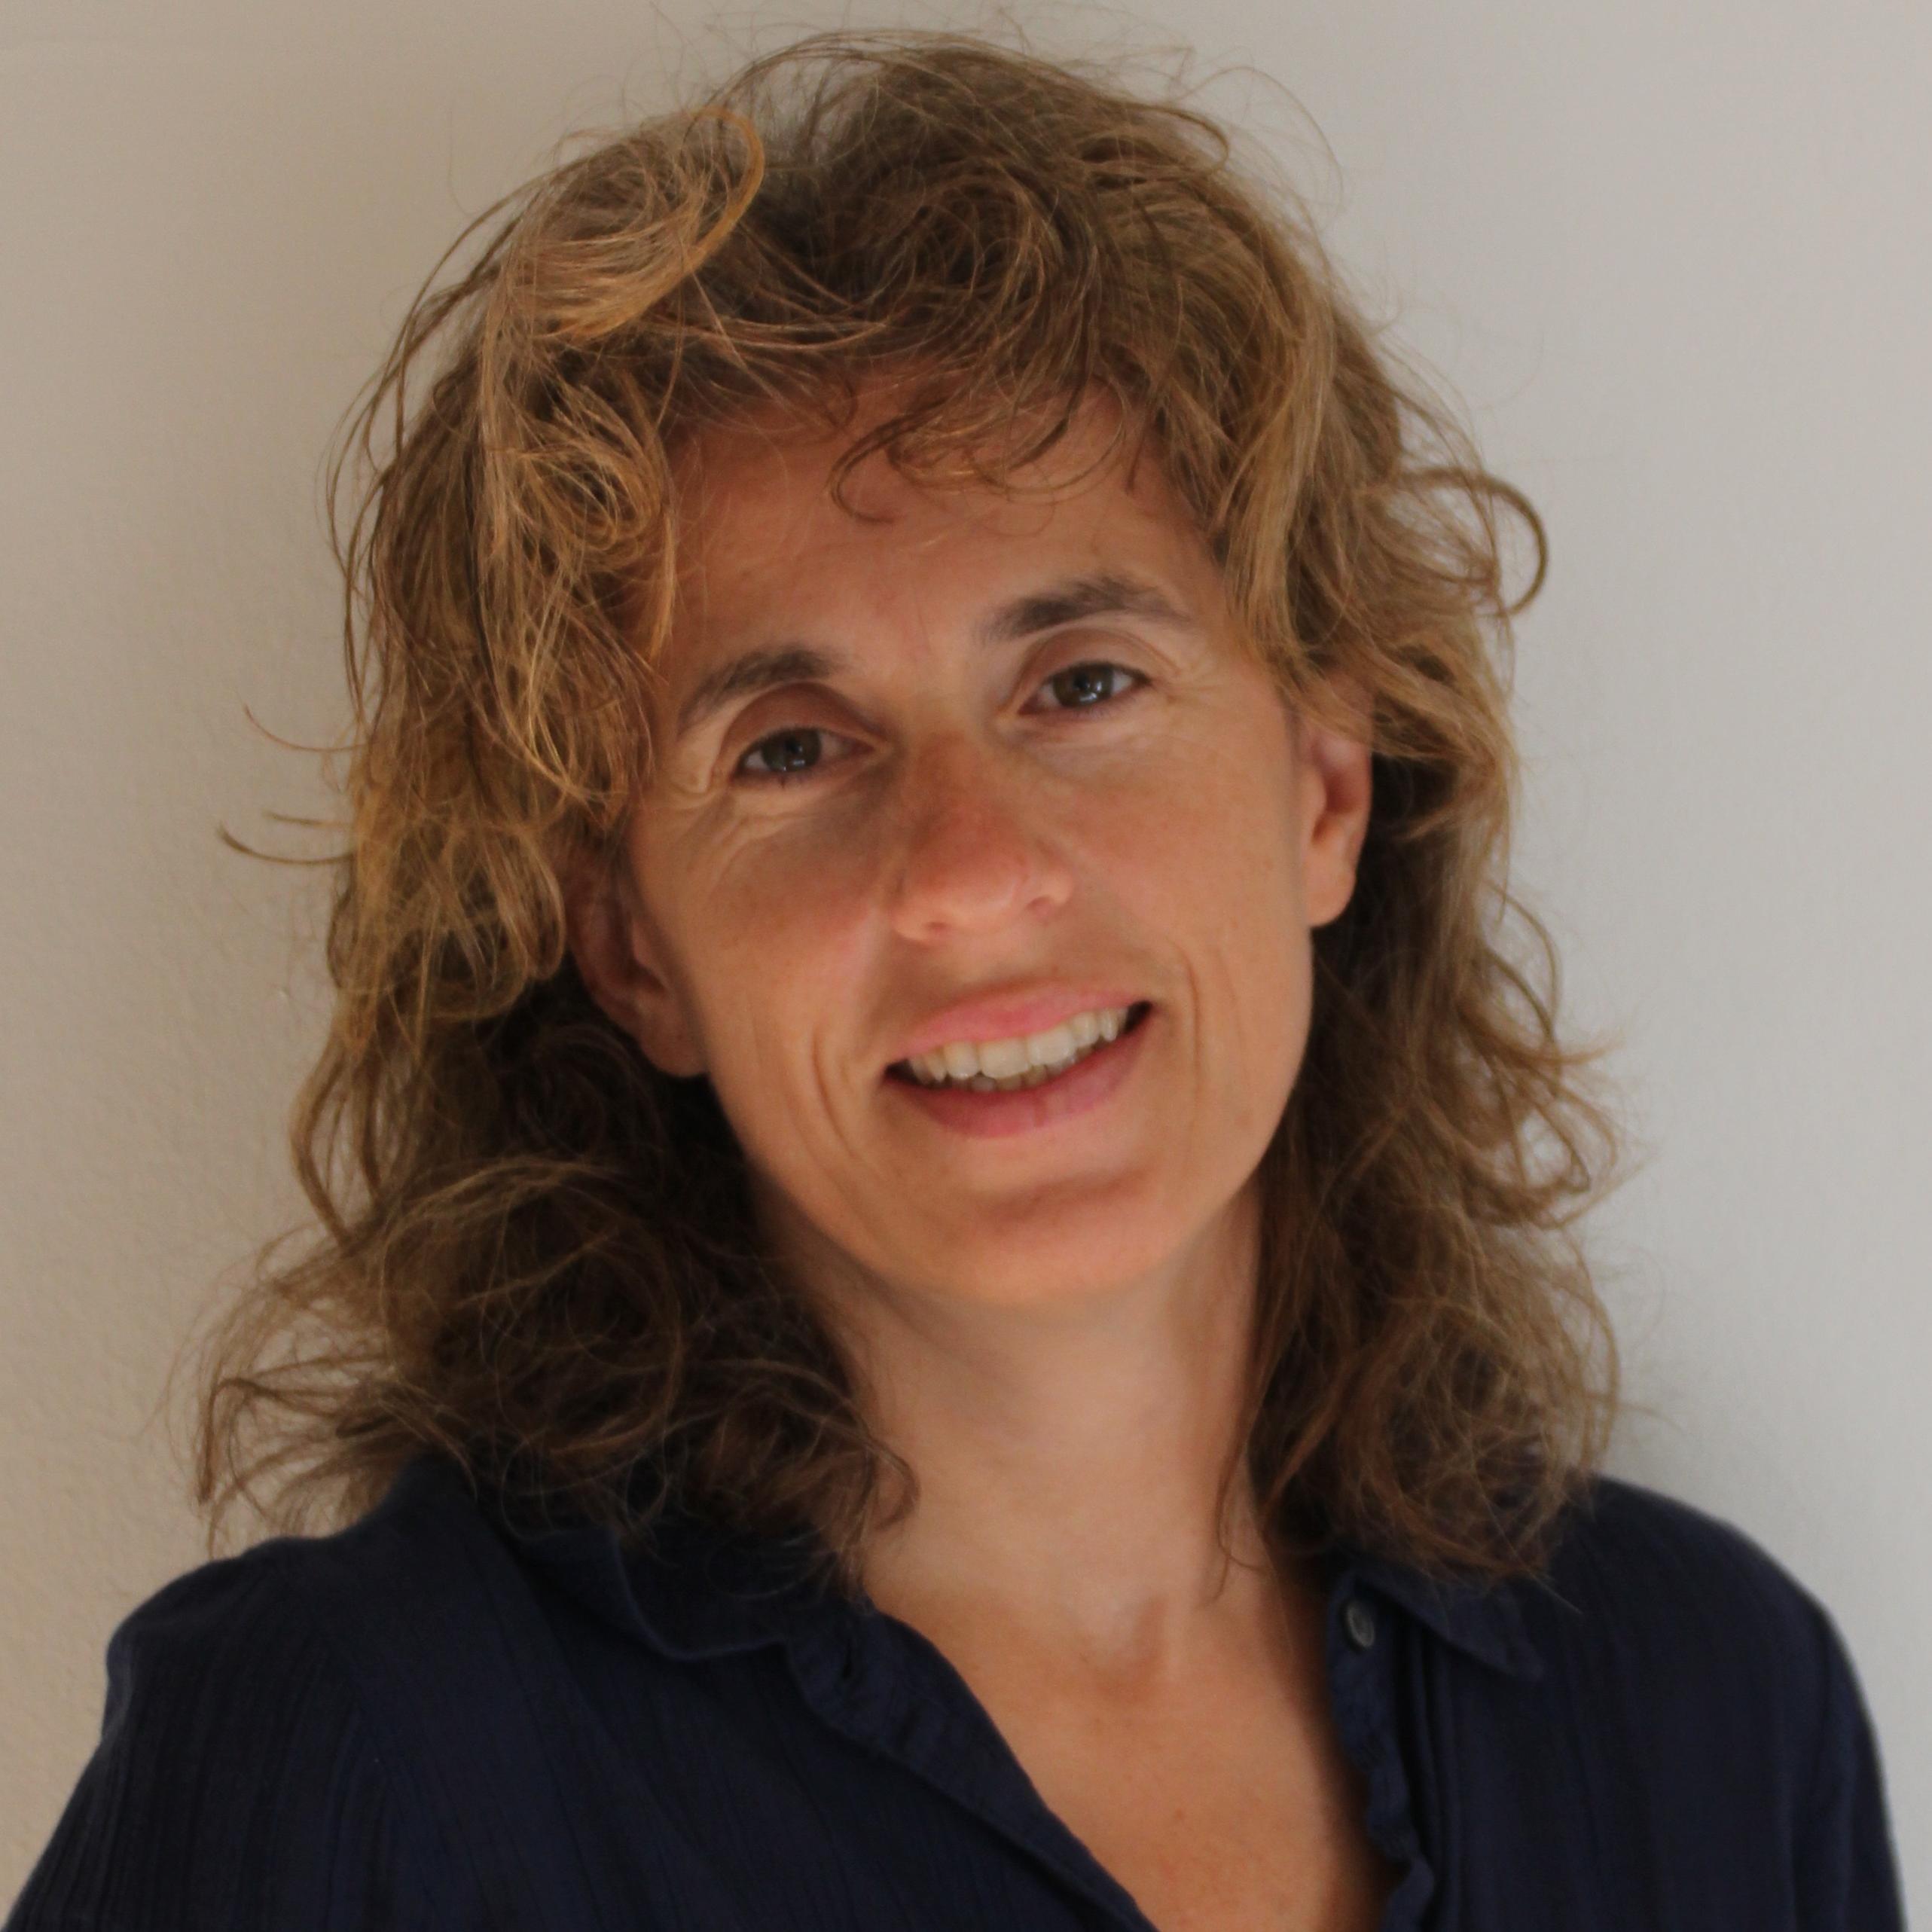 Alessandra Nardi